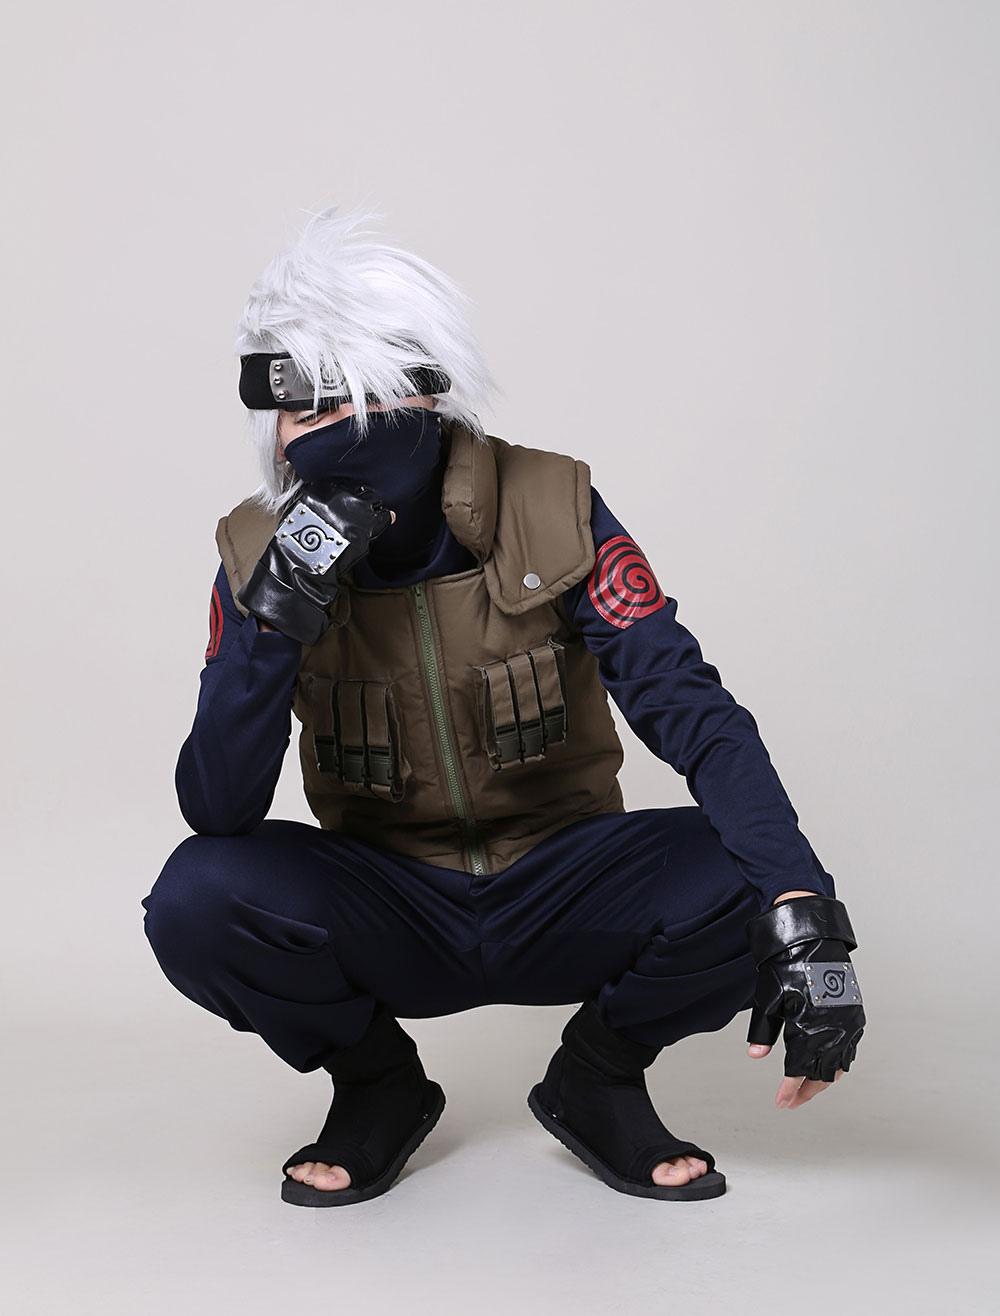 Naruto cosplay costumes,Naruto cosplay costume,Naruto ...